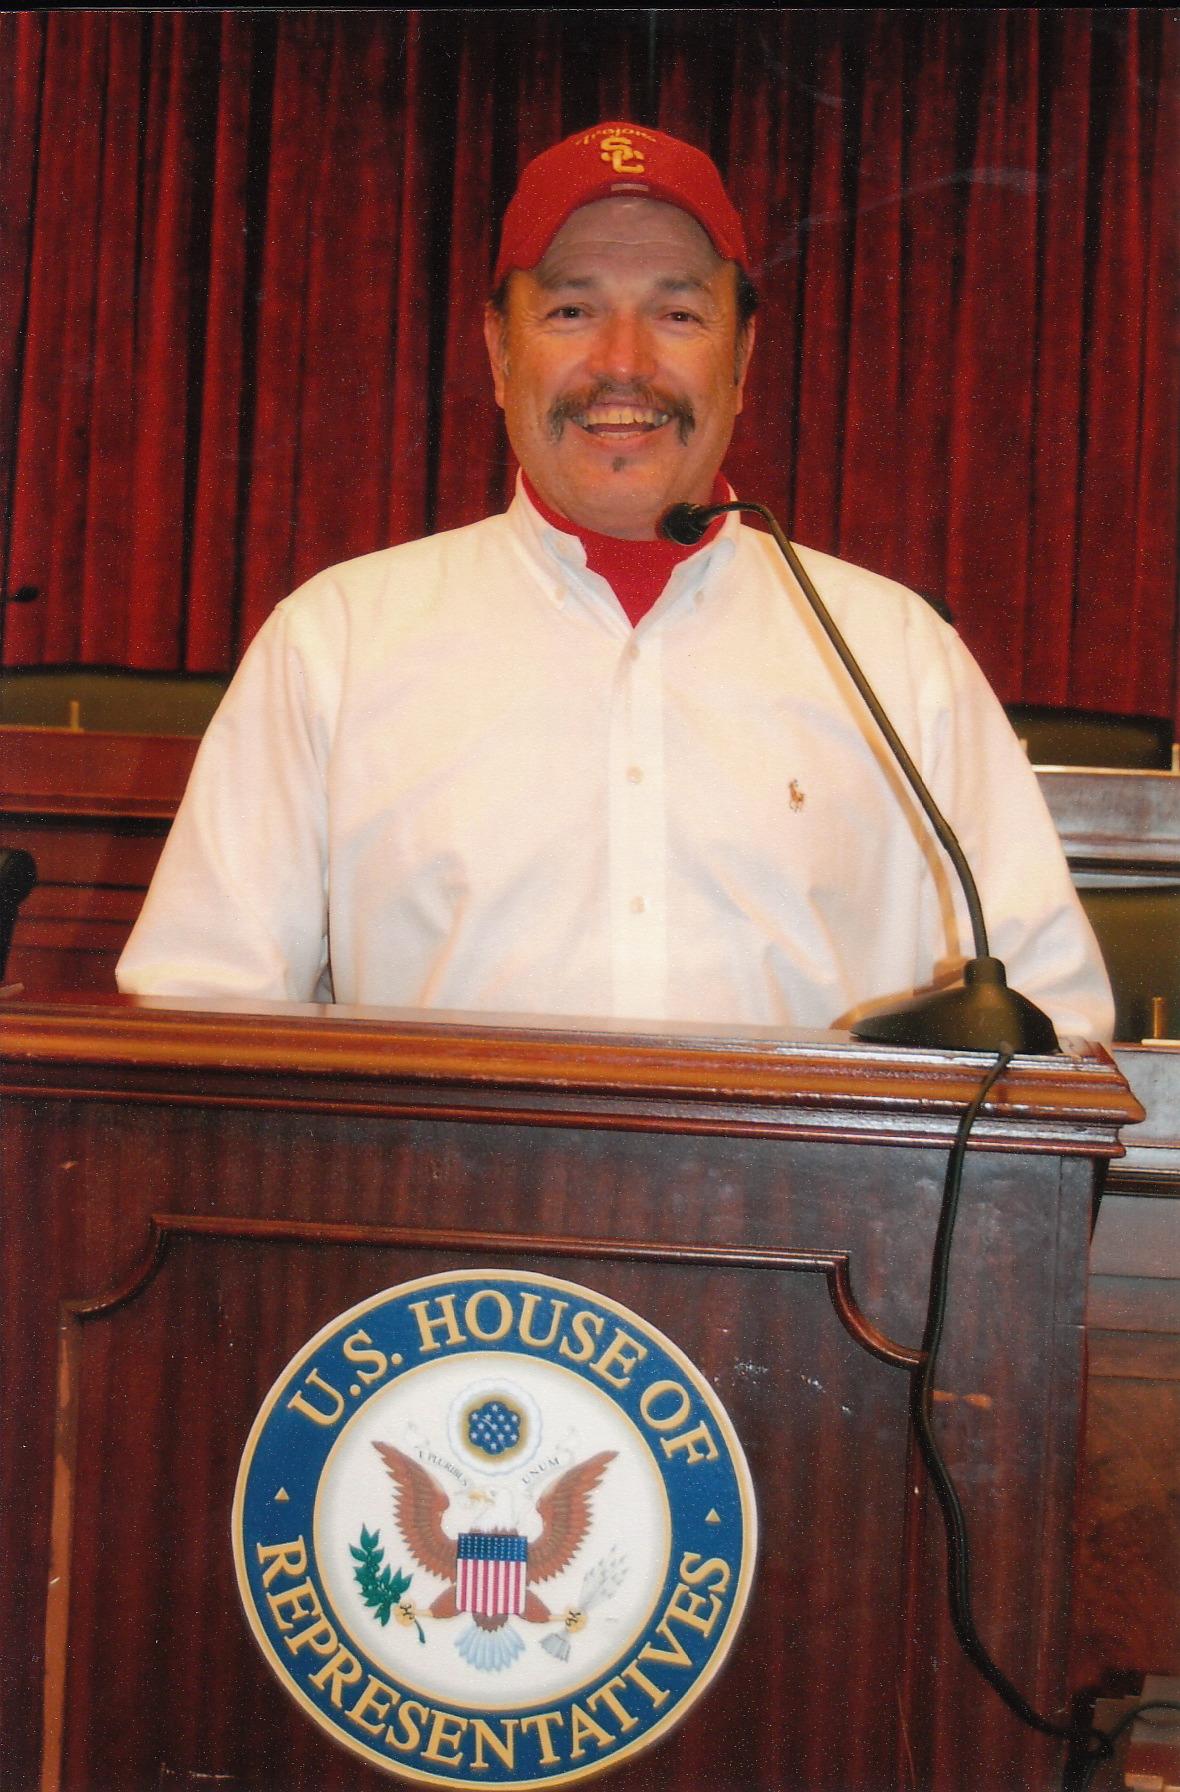 Tony in the U.S. House of Representatives